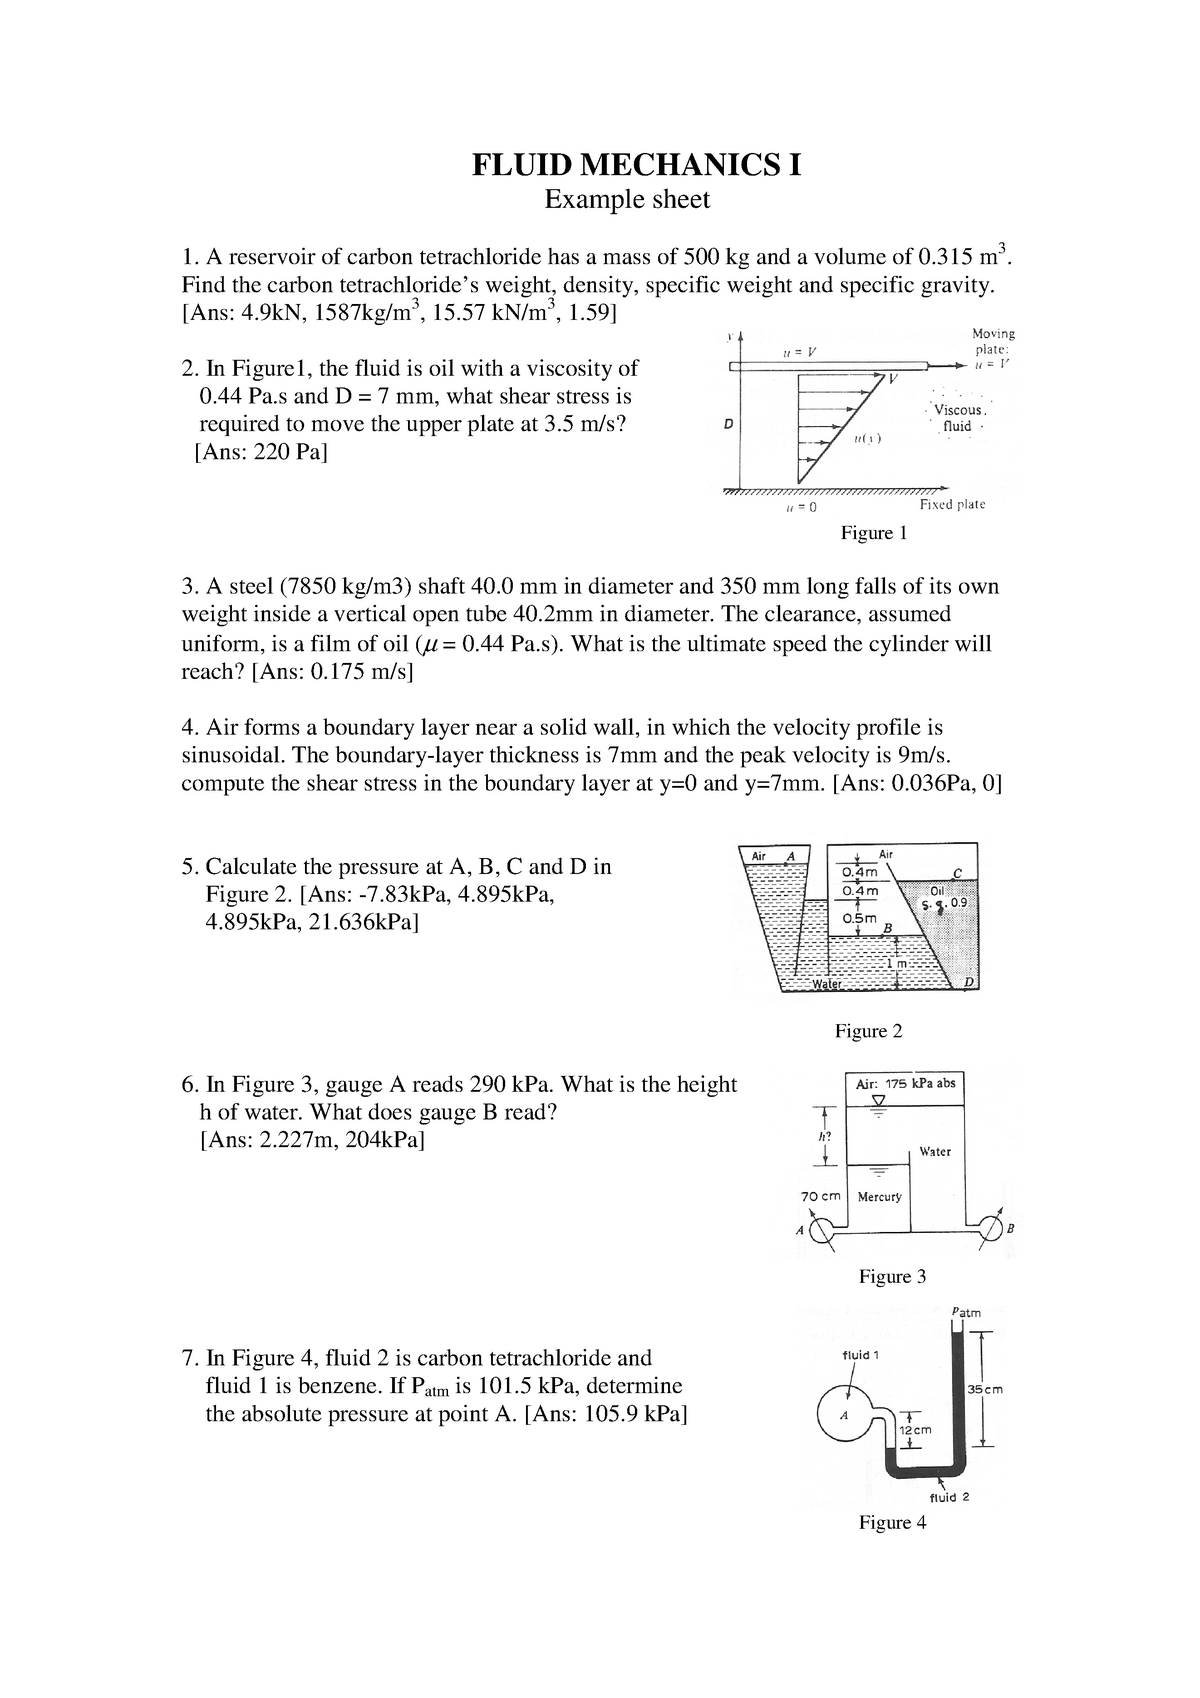 Example Sheet A - Fluid Mechanics I EGA117 - Swansea - StuDocu